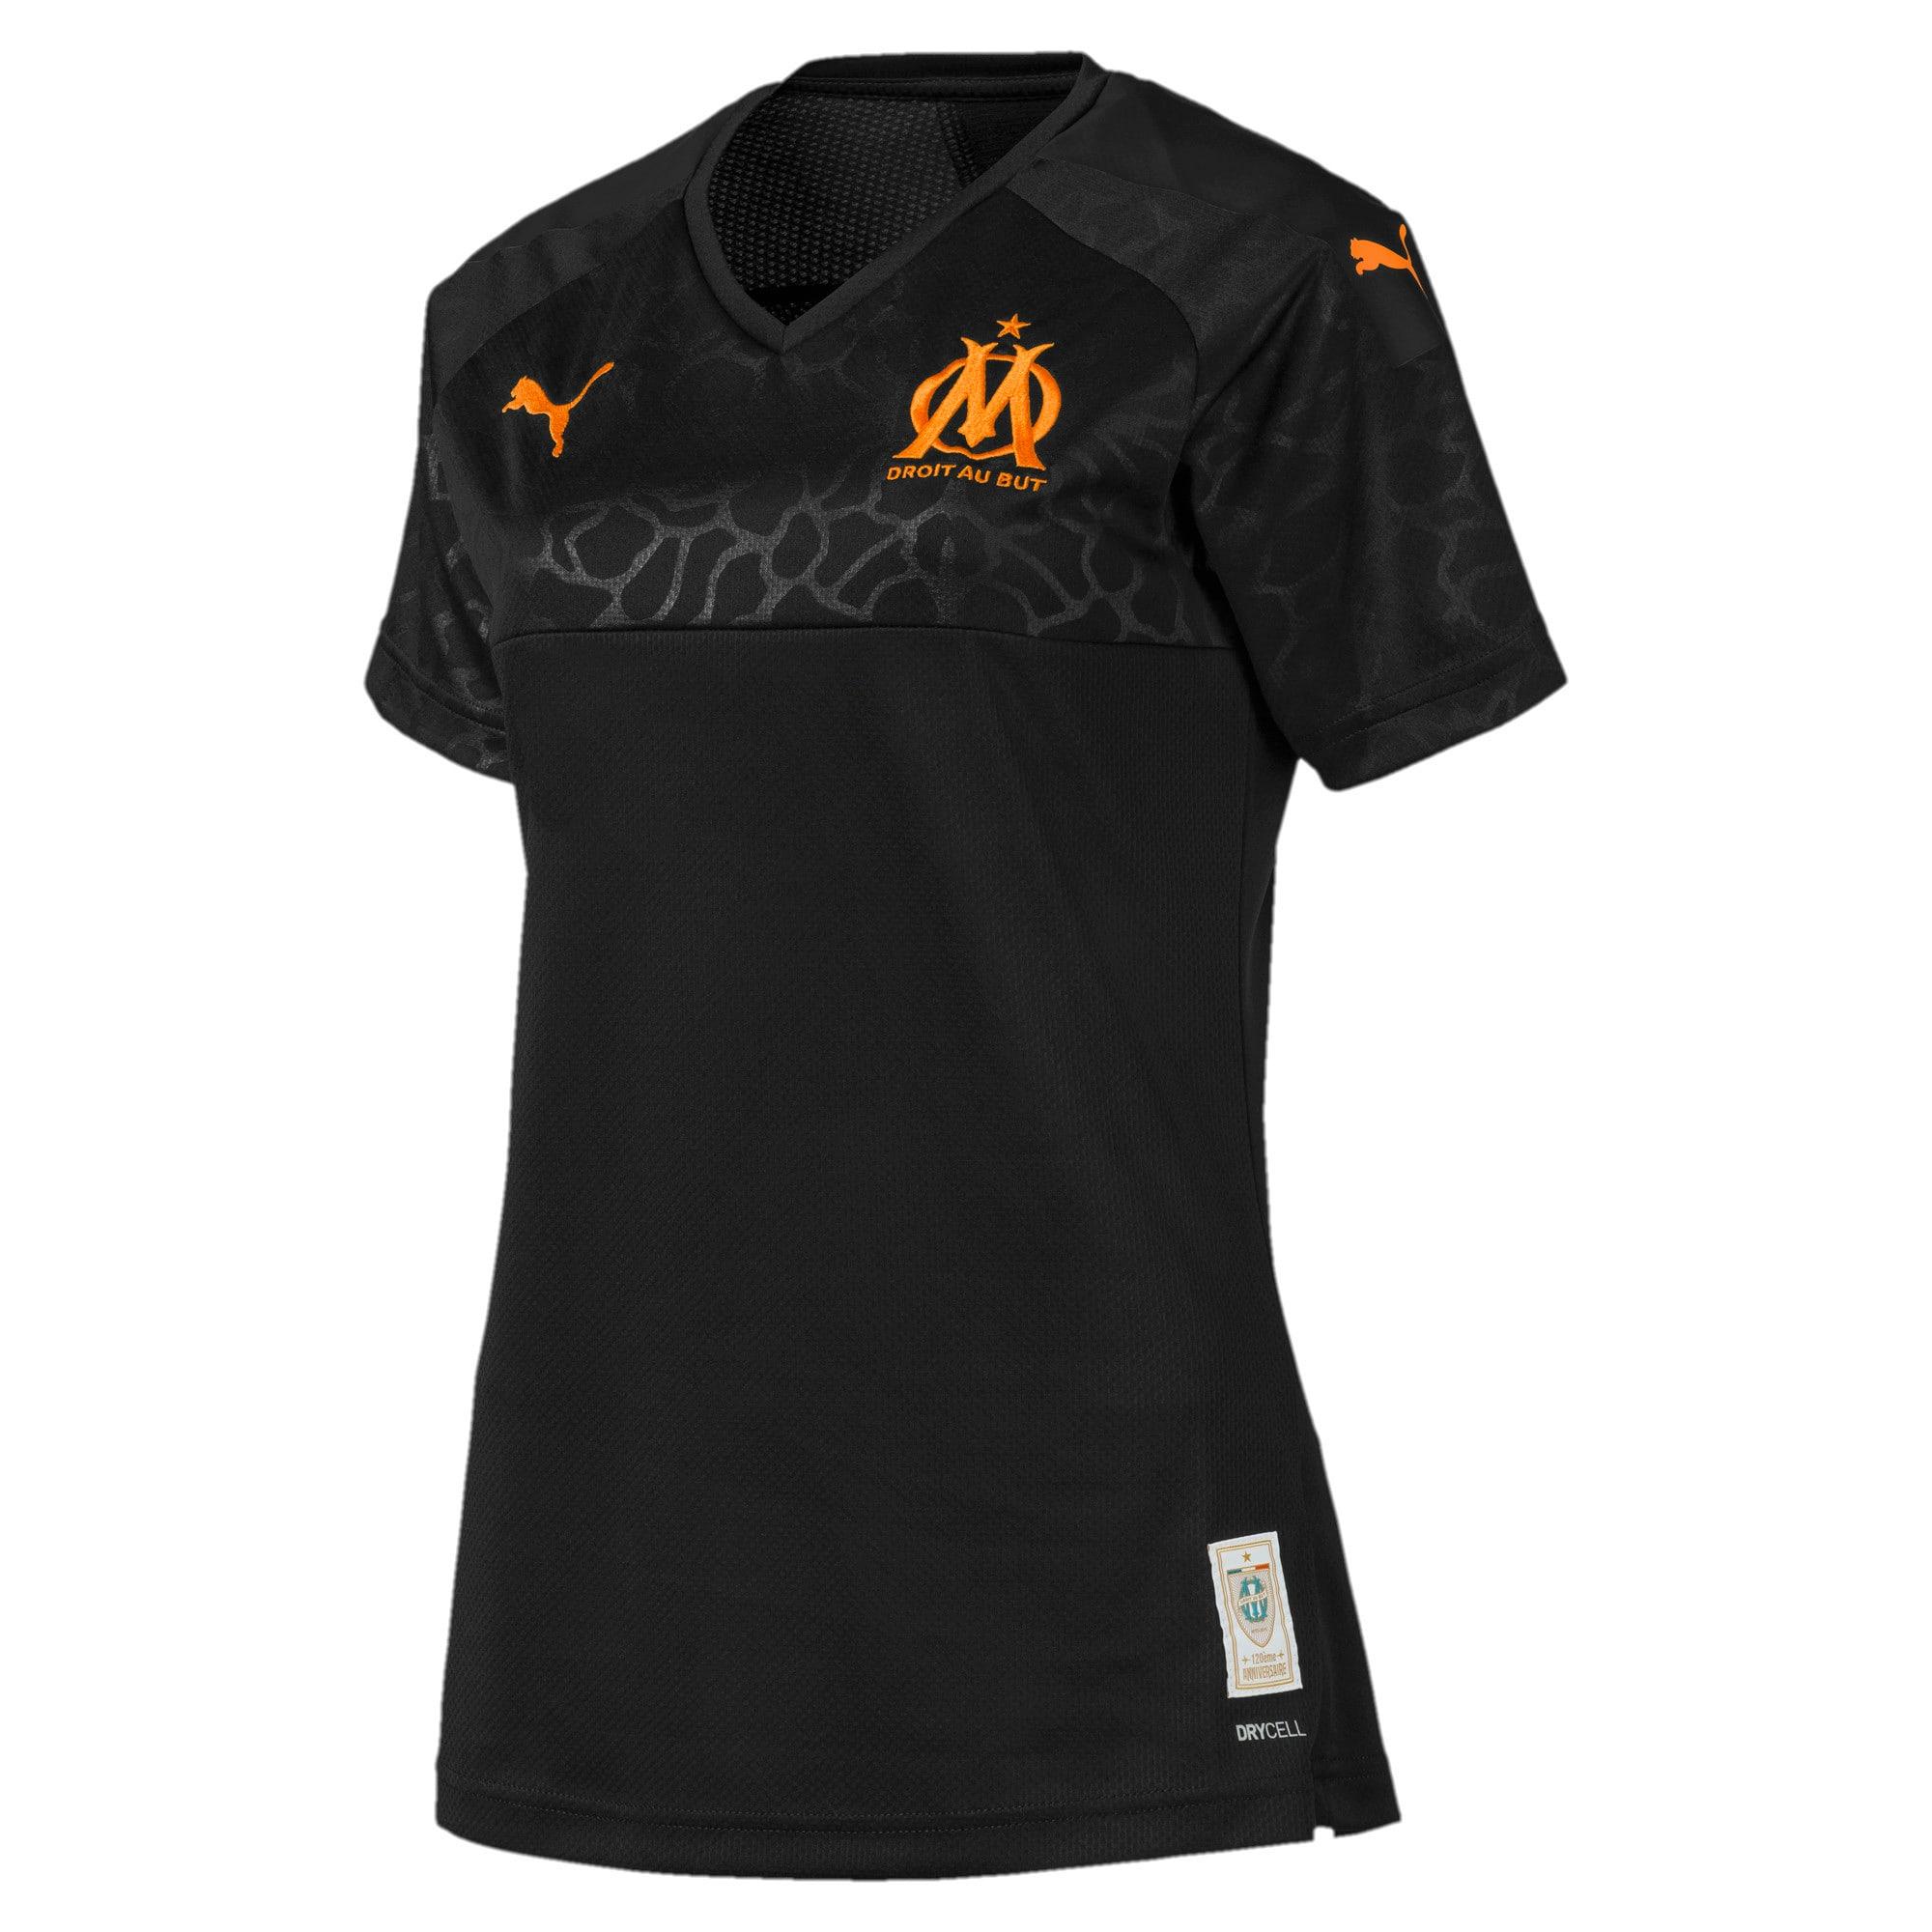 Thumbnail 1 of Olympique de Marseille replica-derdeshirt voor dames, Puma Black-Orange Popsicle, medium